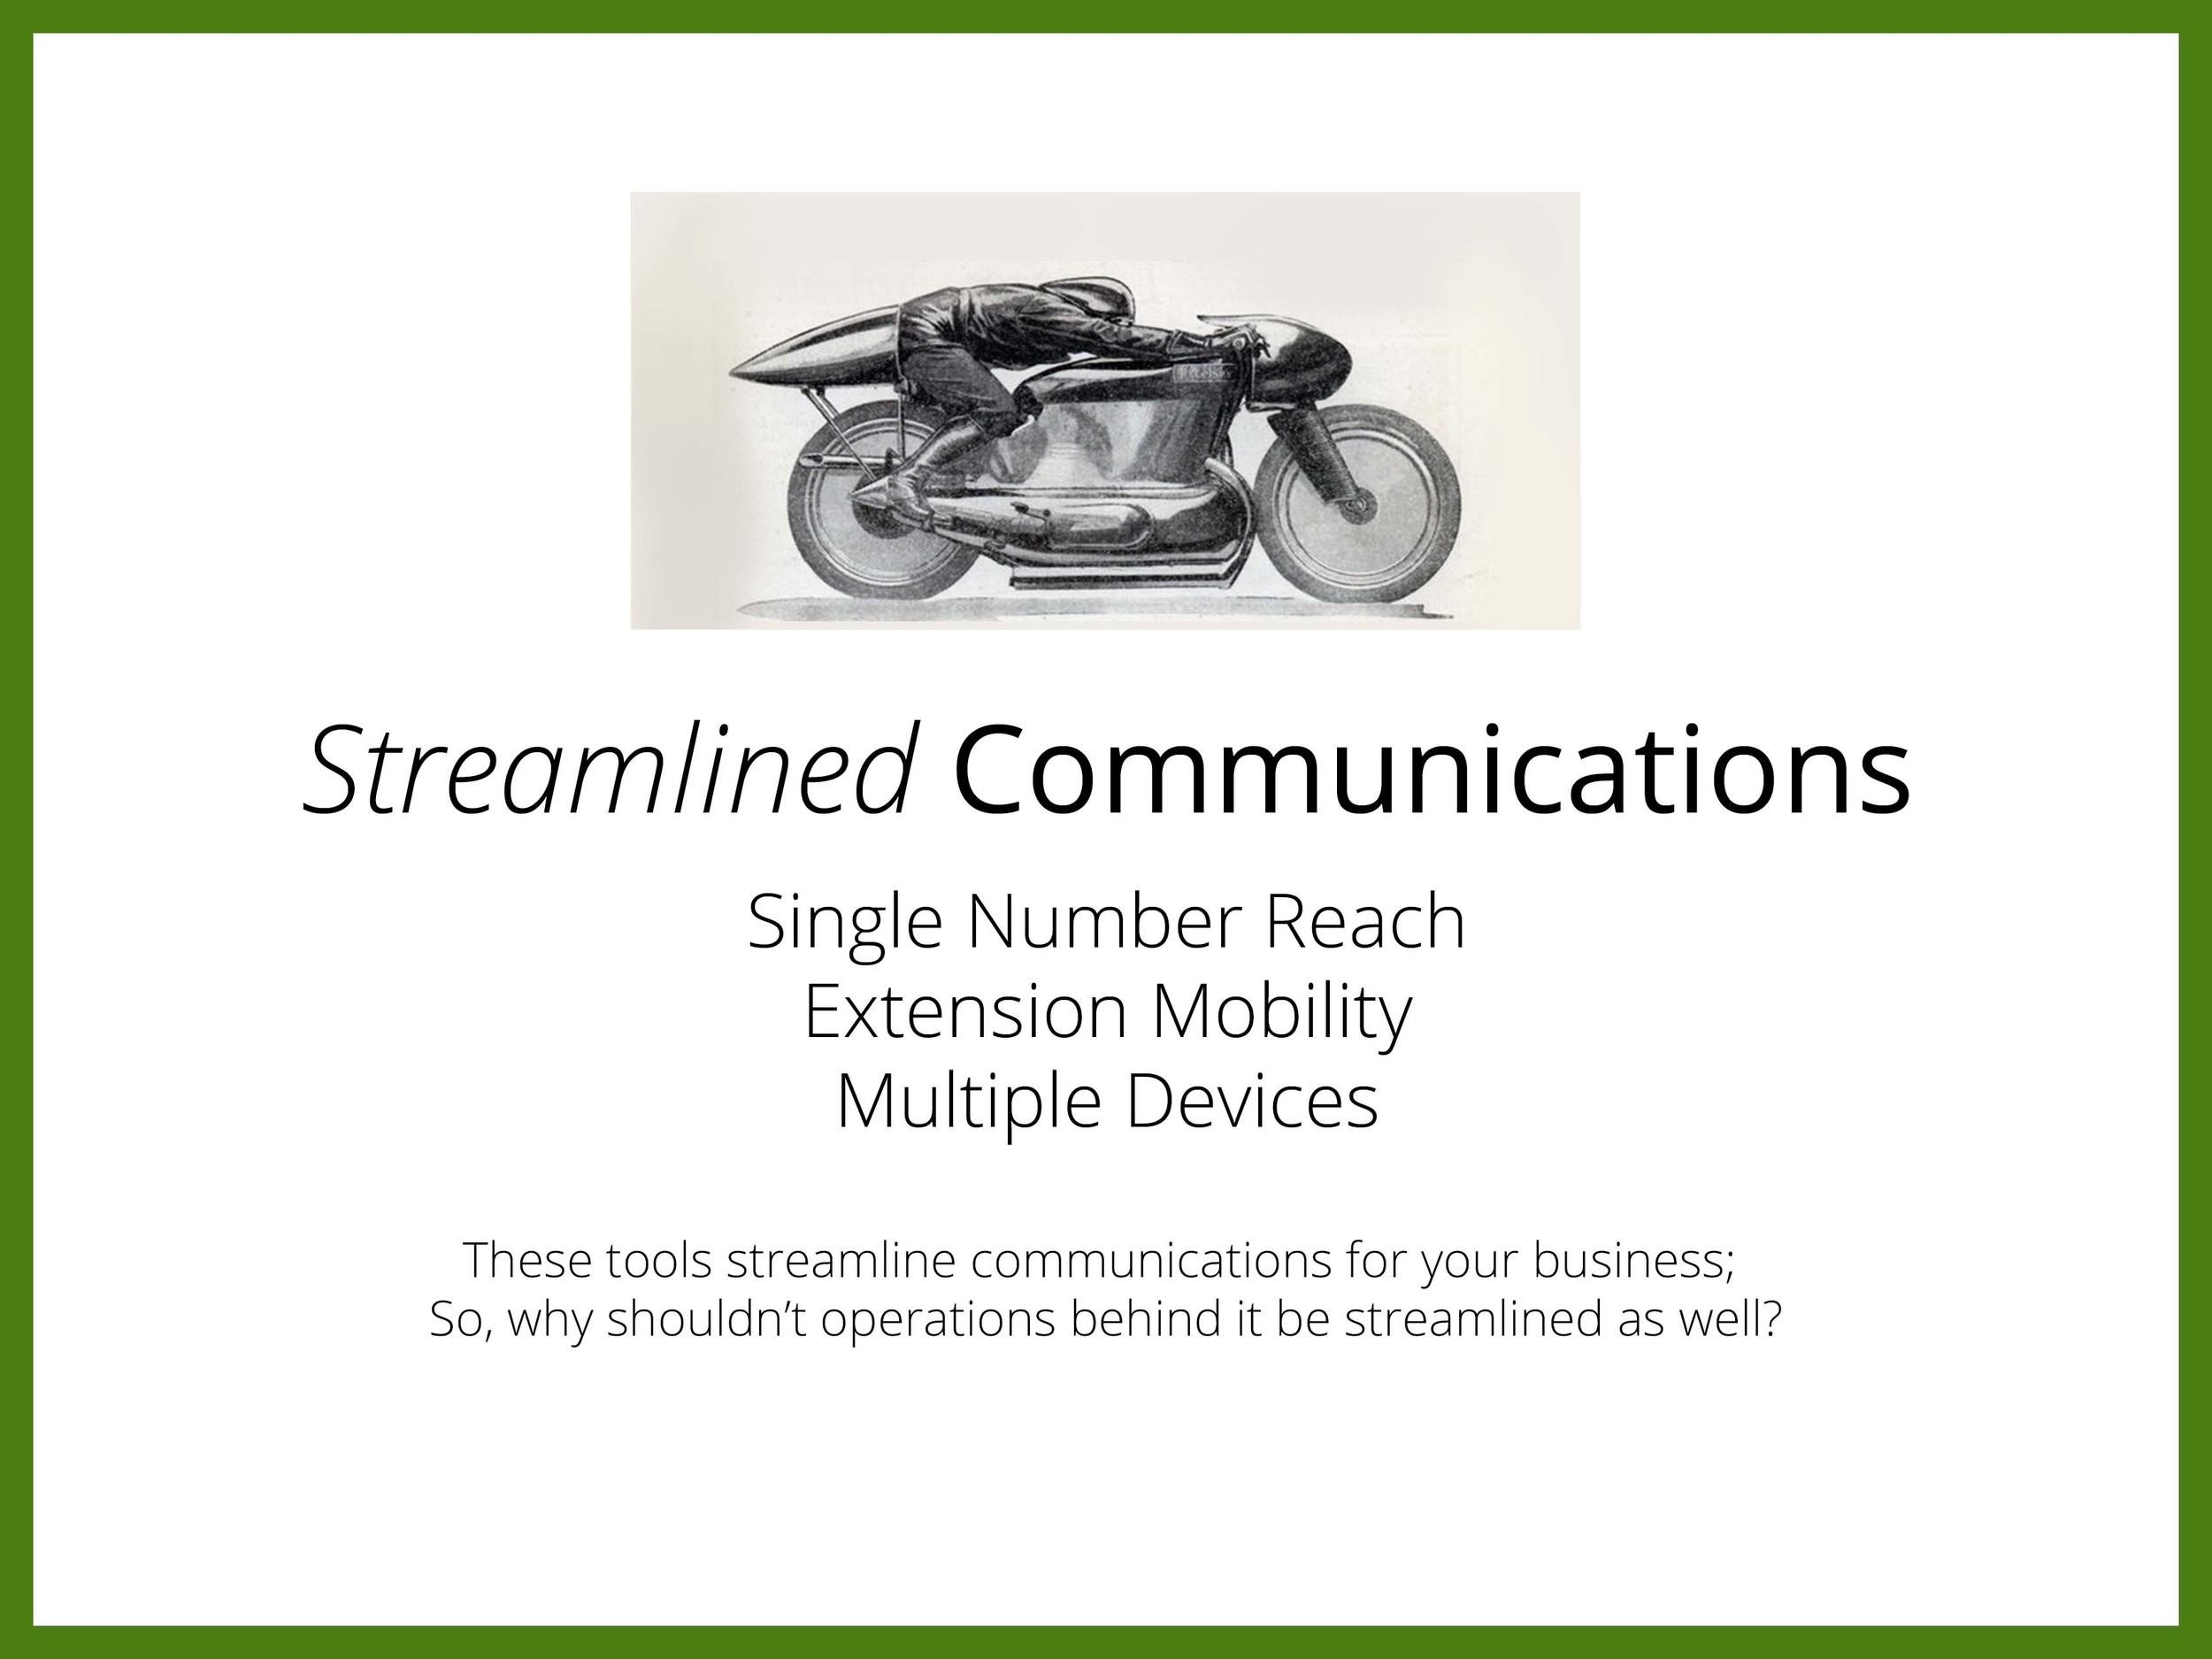 b2b presentation on provisioning streamlined communications.jpg